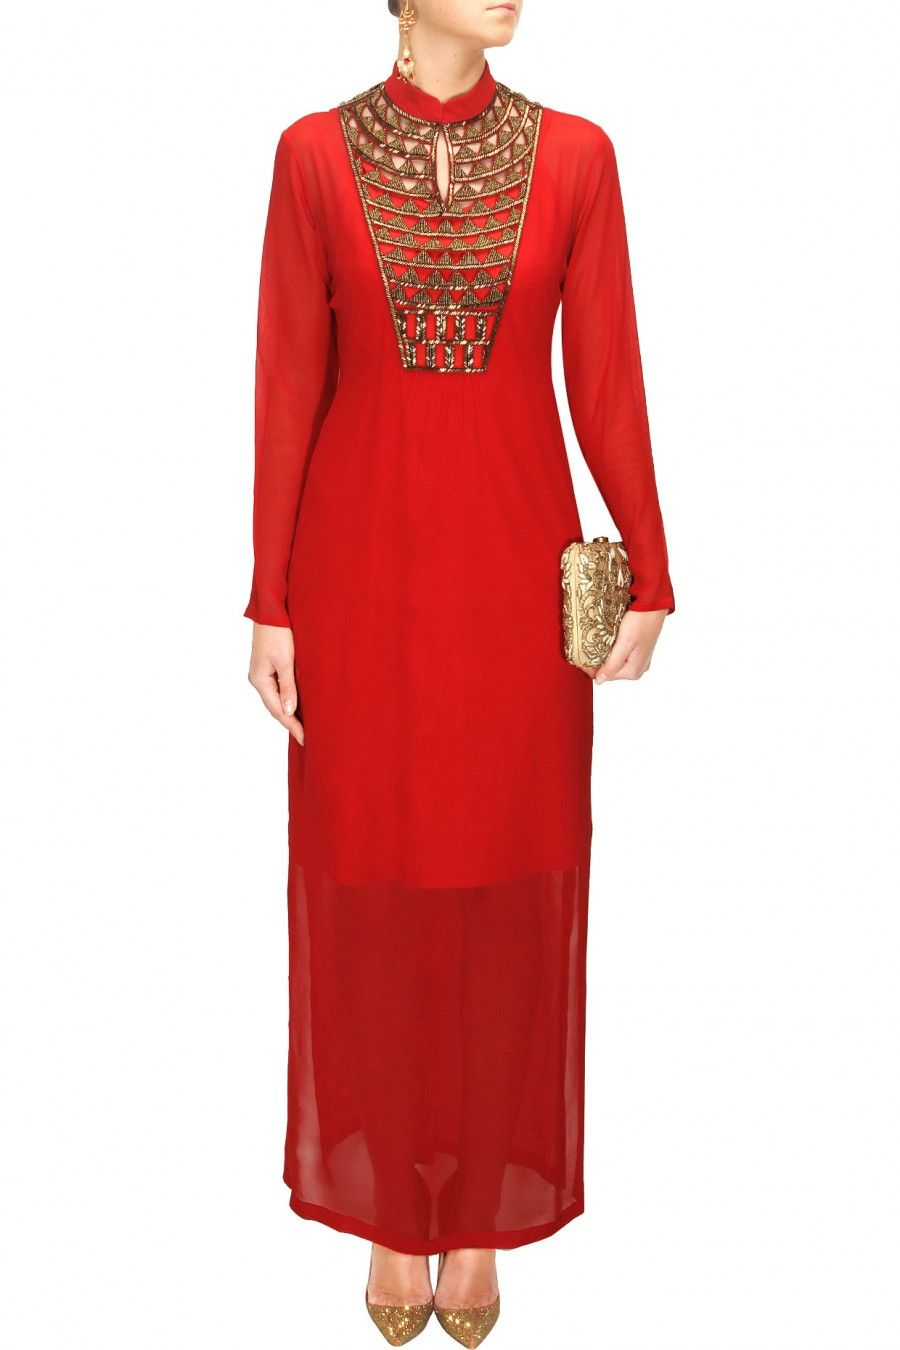 Urvashi joneja all apparels pinterest kurtis indian ethnic